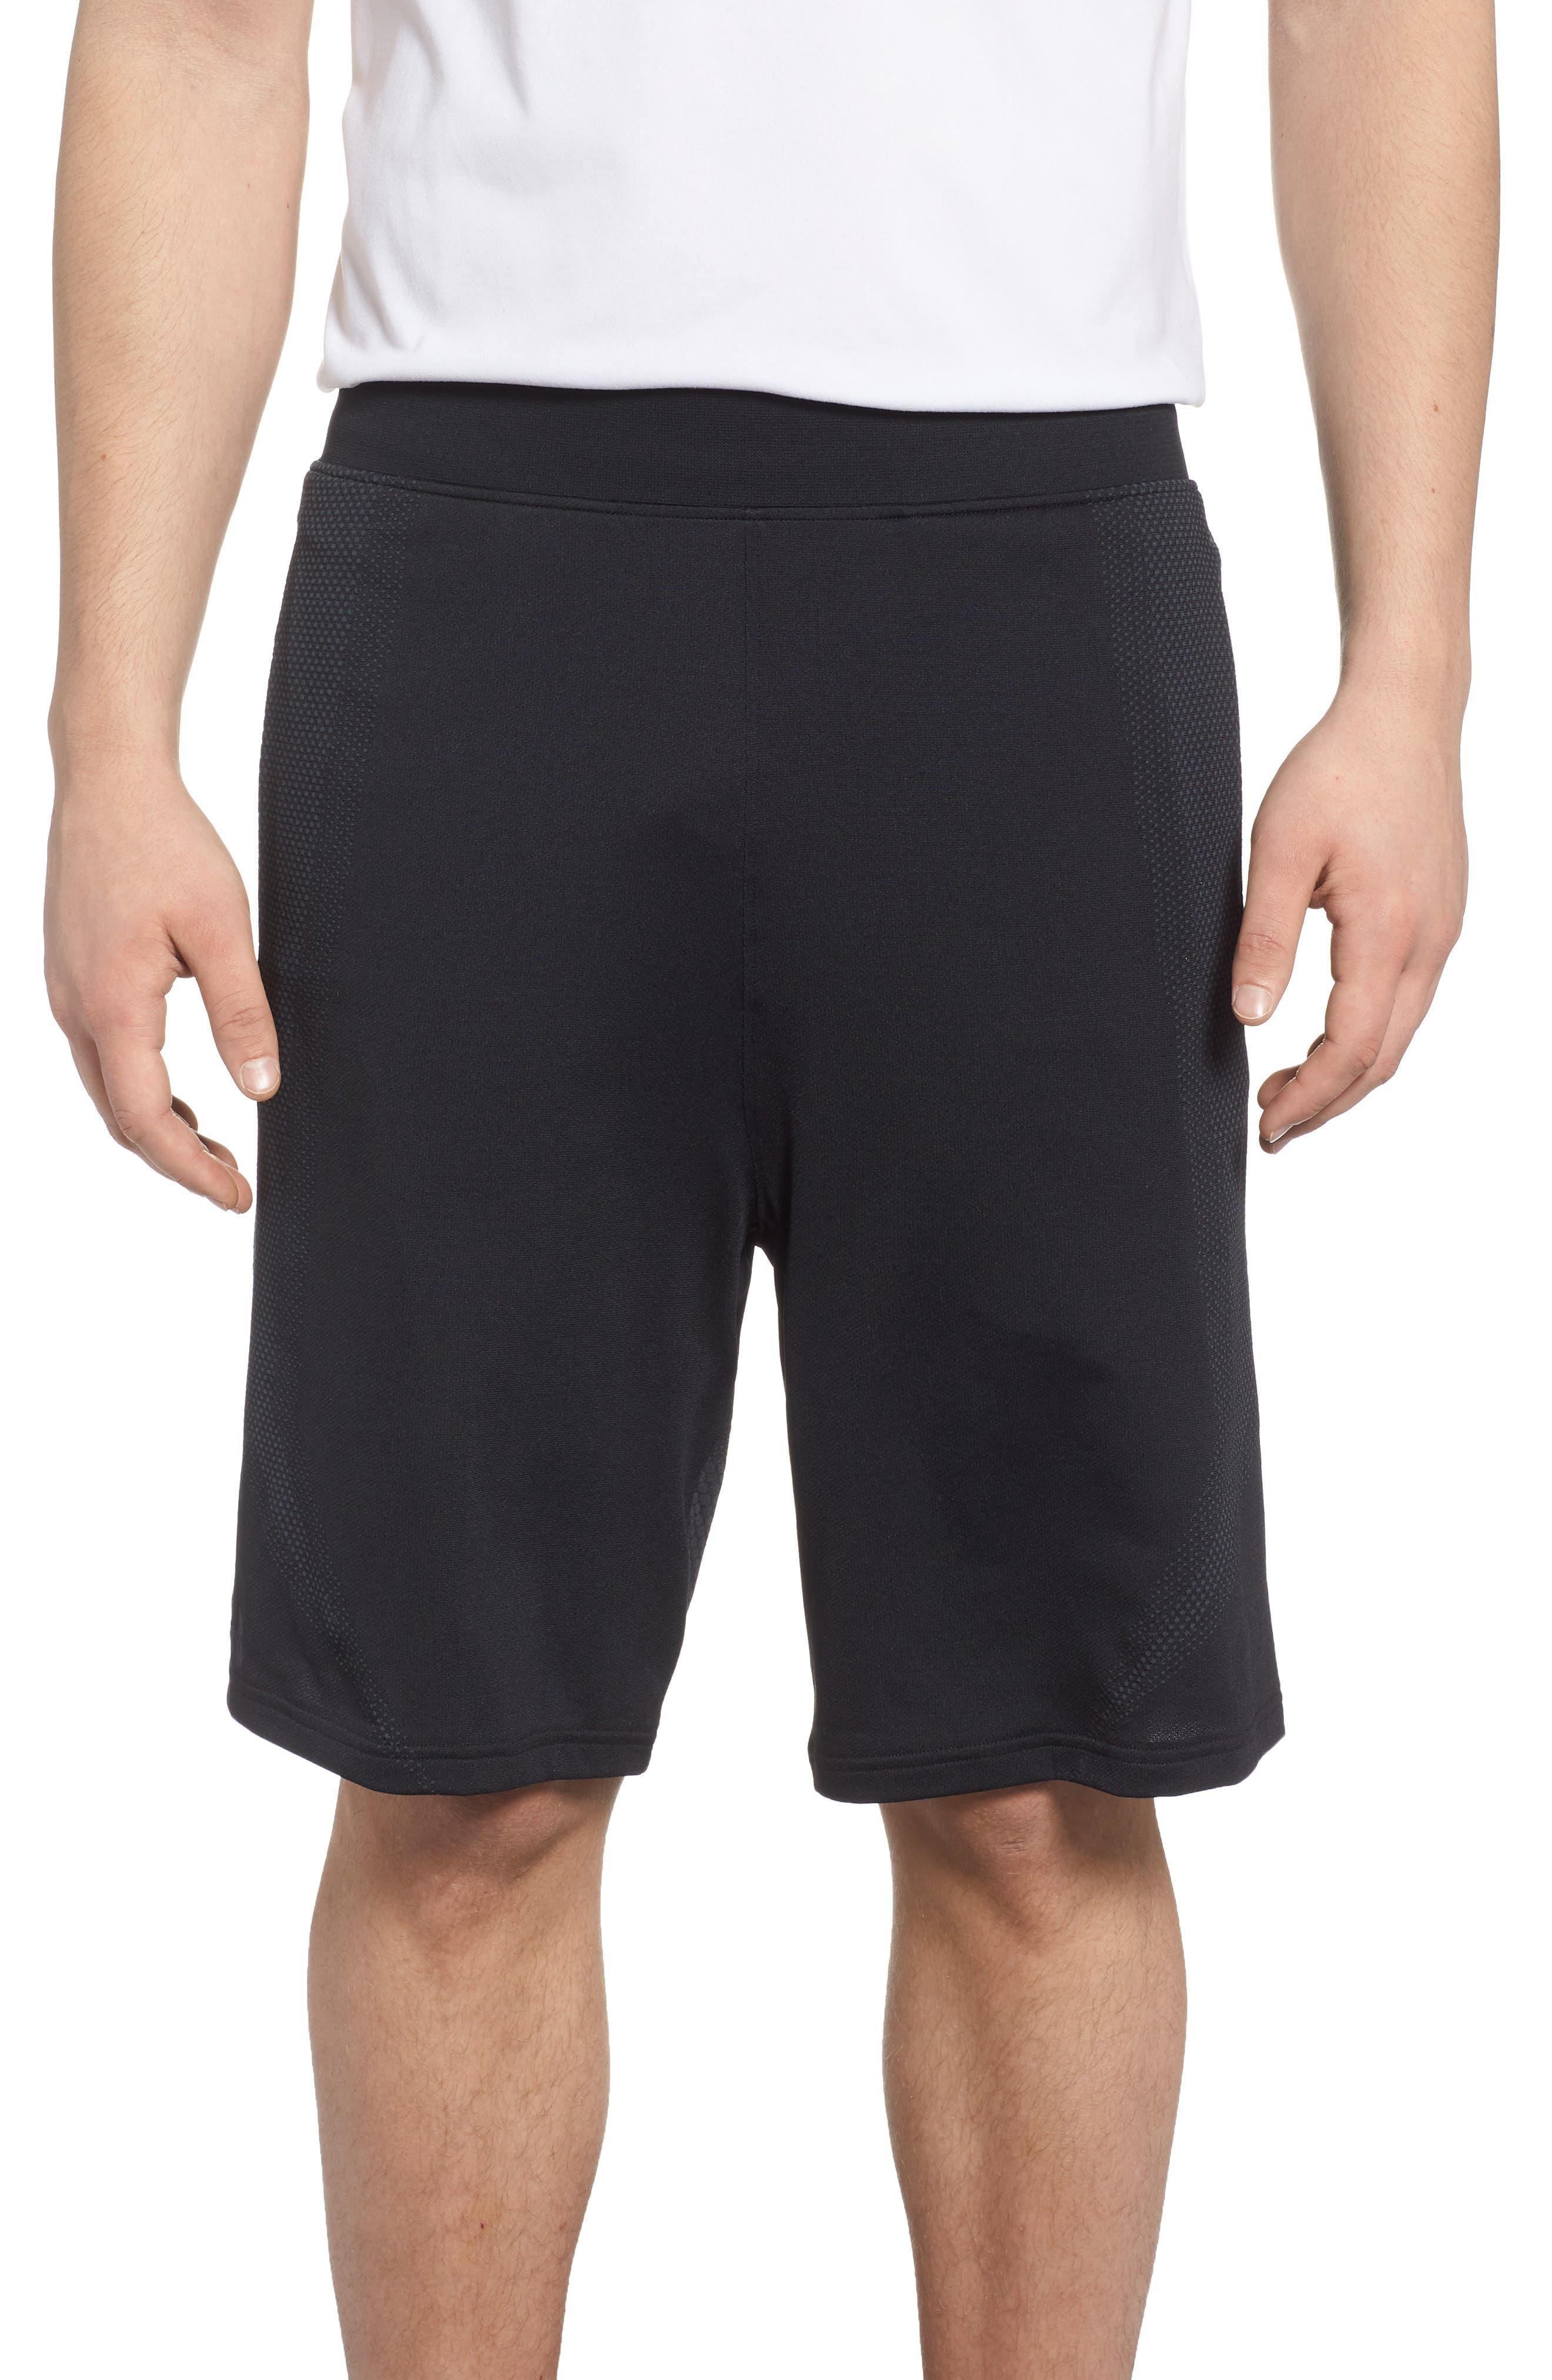 Threadborne Seamless Shorts,                             Main thumbnail 1, color,                             BLACK/ STEALTH GREH